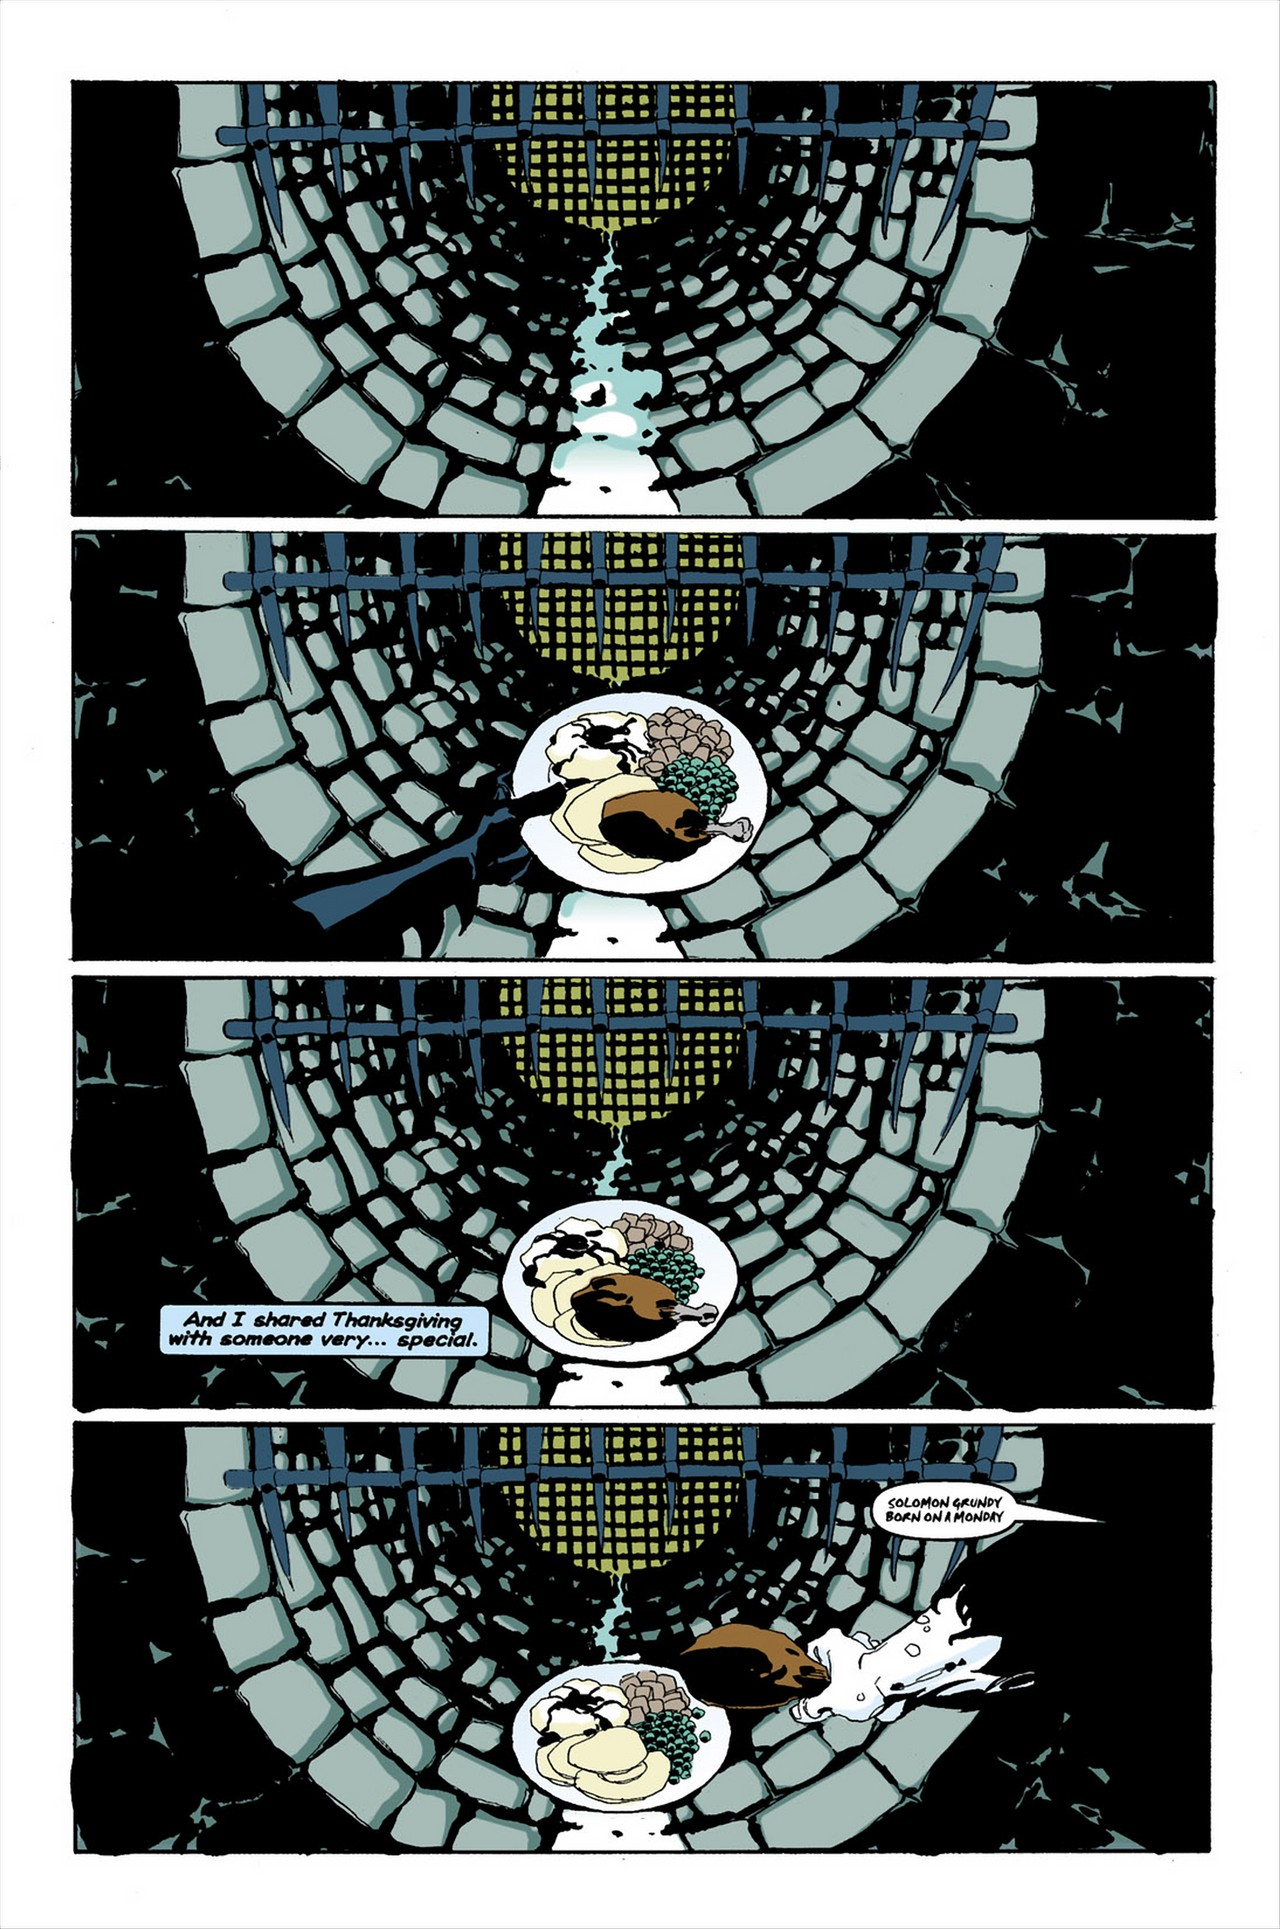 Psychology of Bruce Wayne RCO020